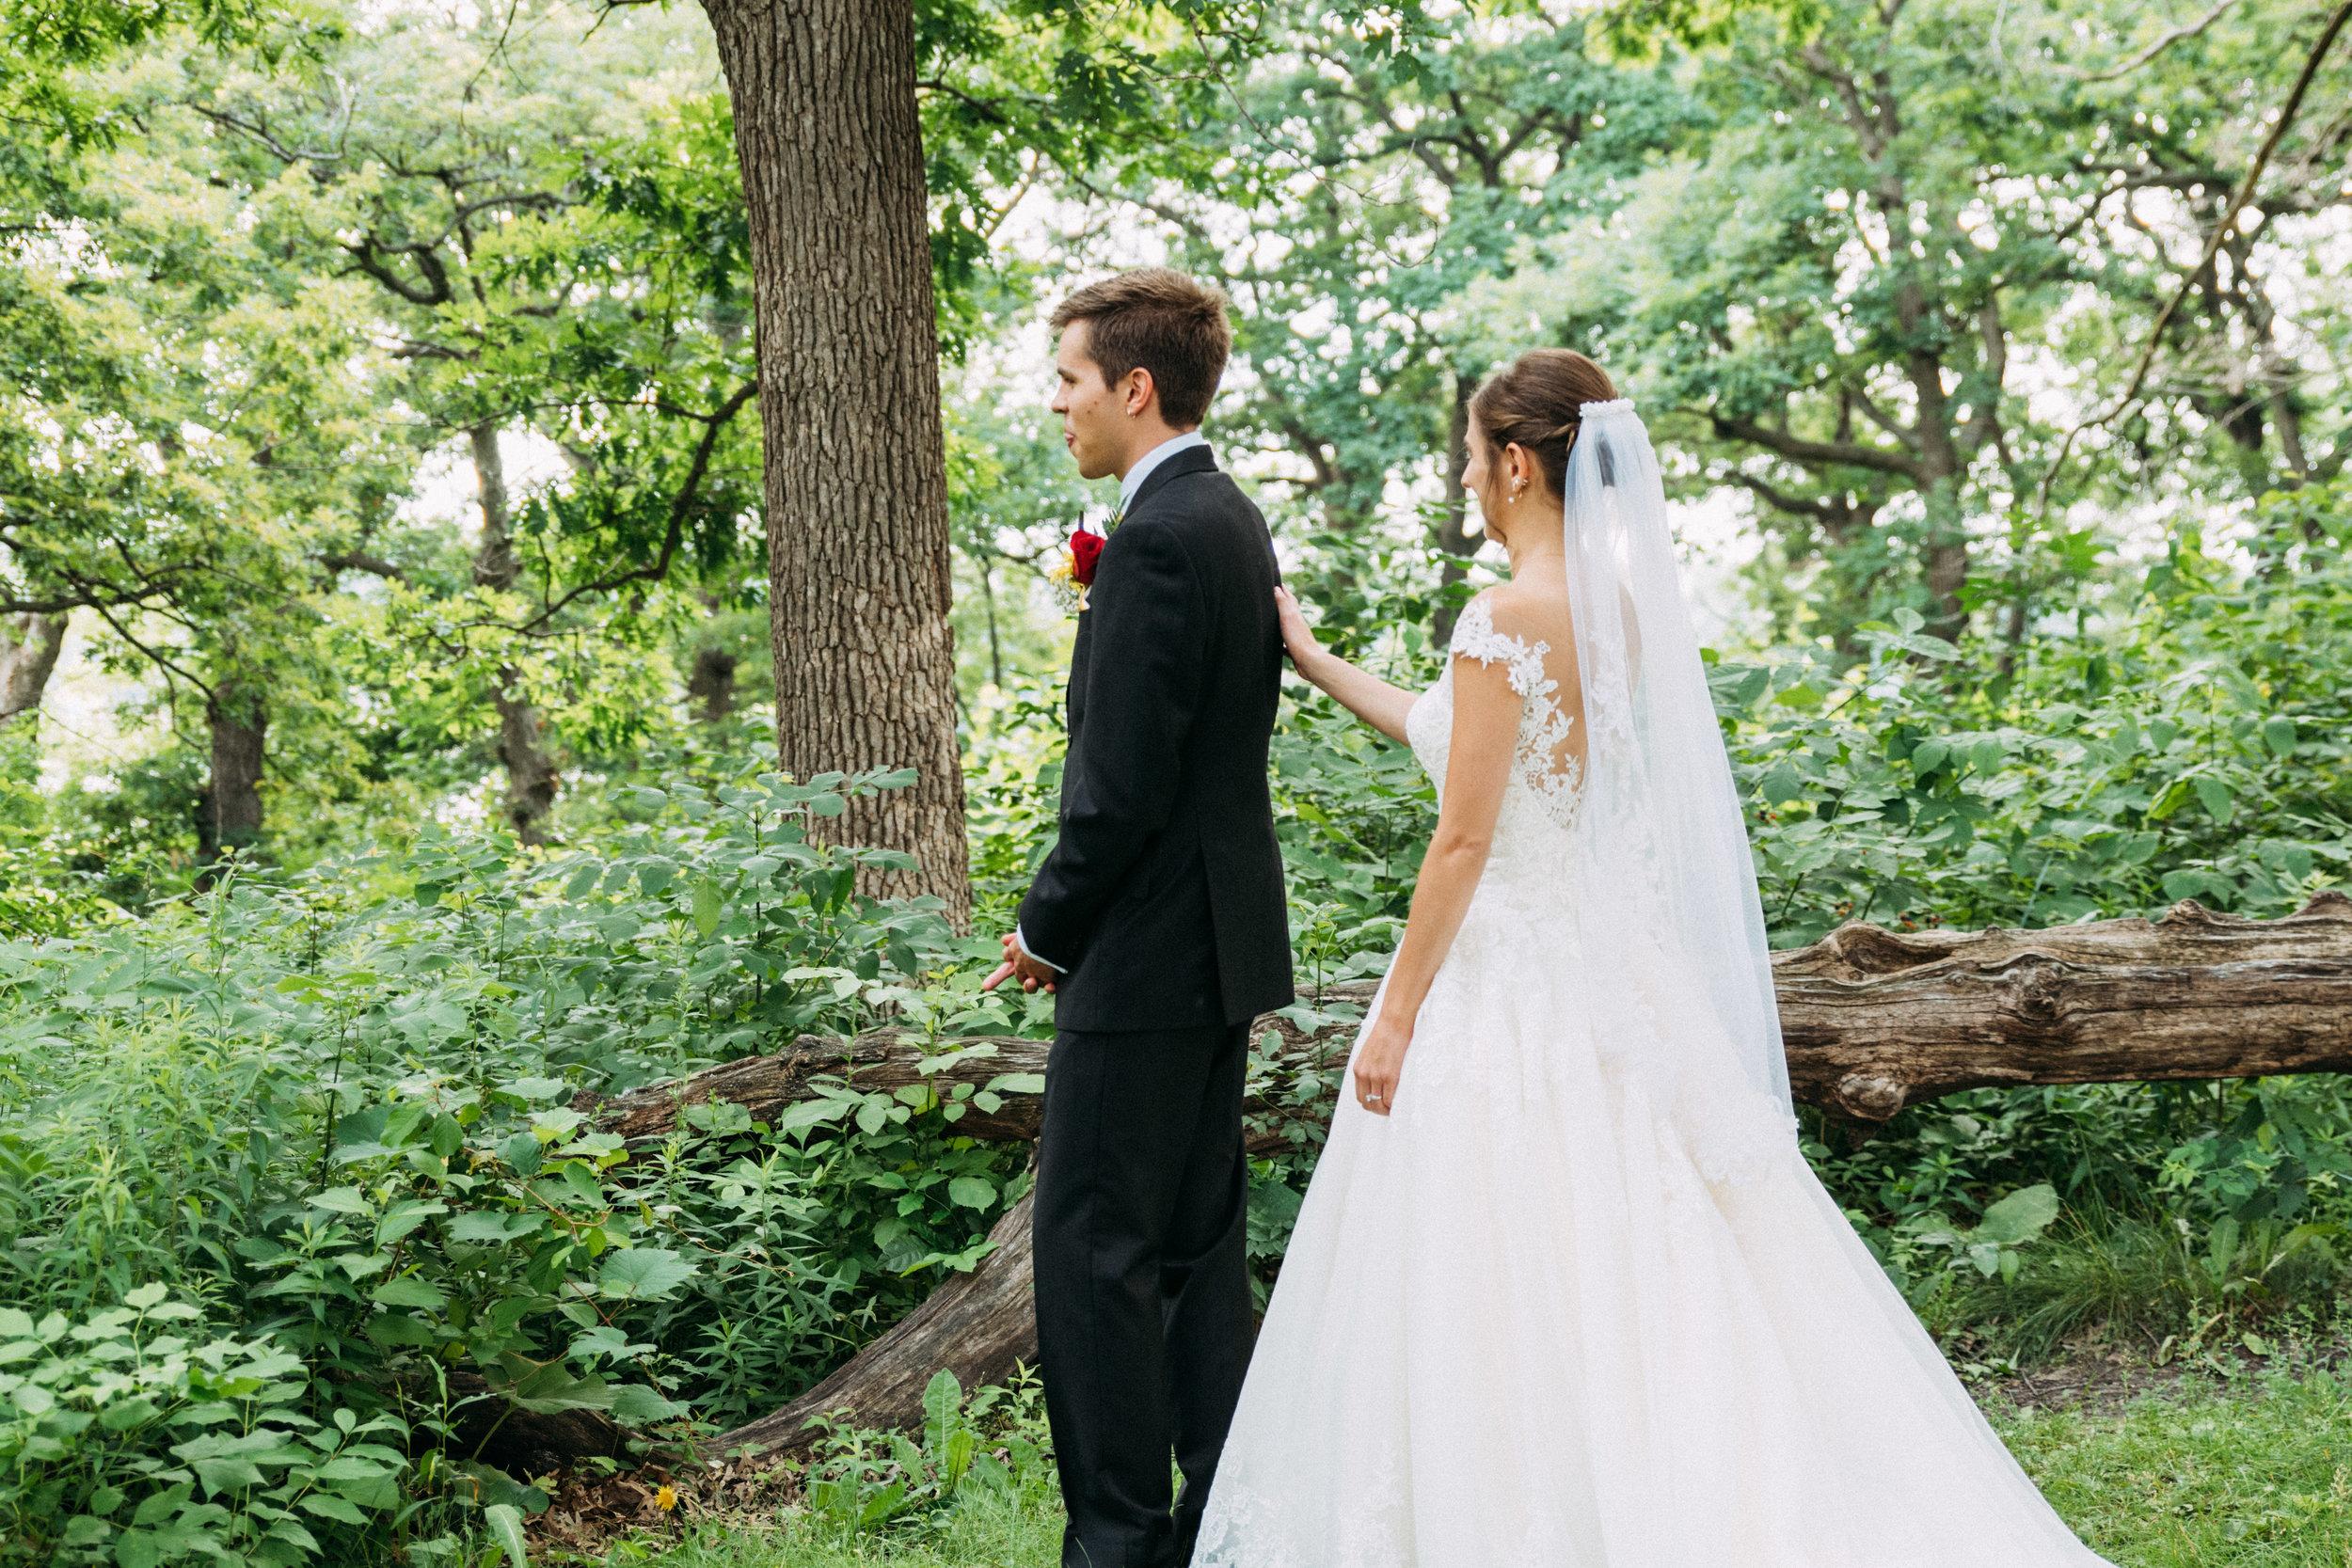 7-Liza_Chris_Minneapolis_Minnesota_Wedding.jpg